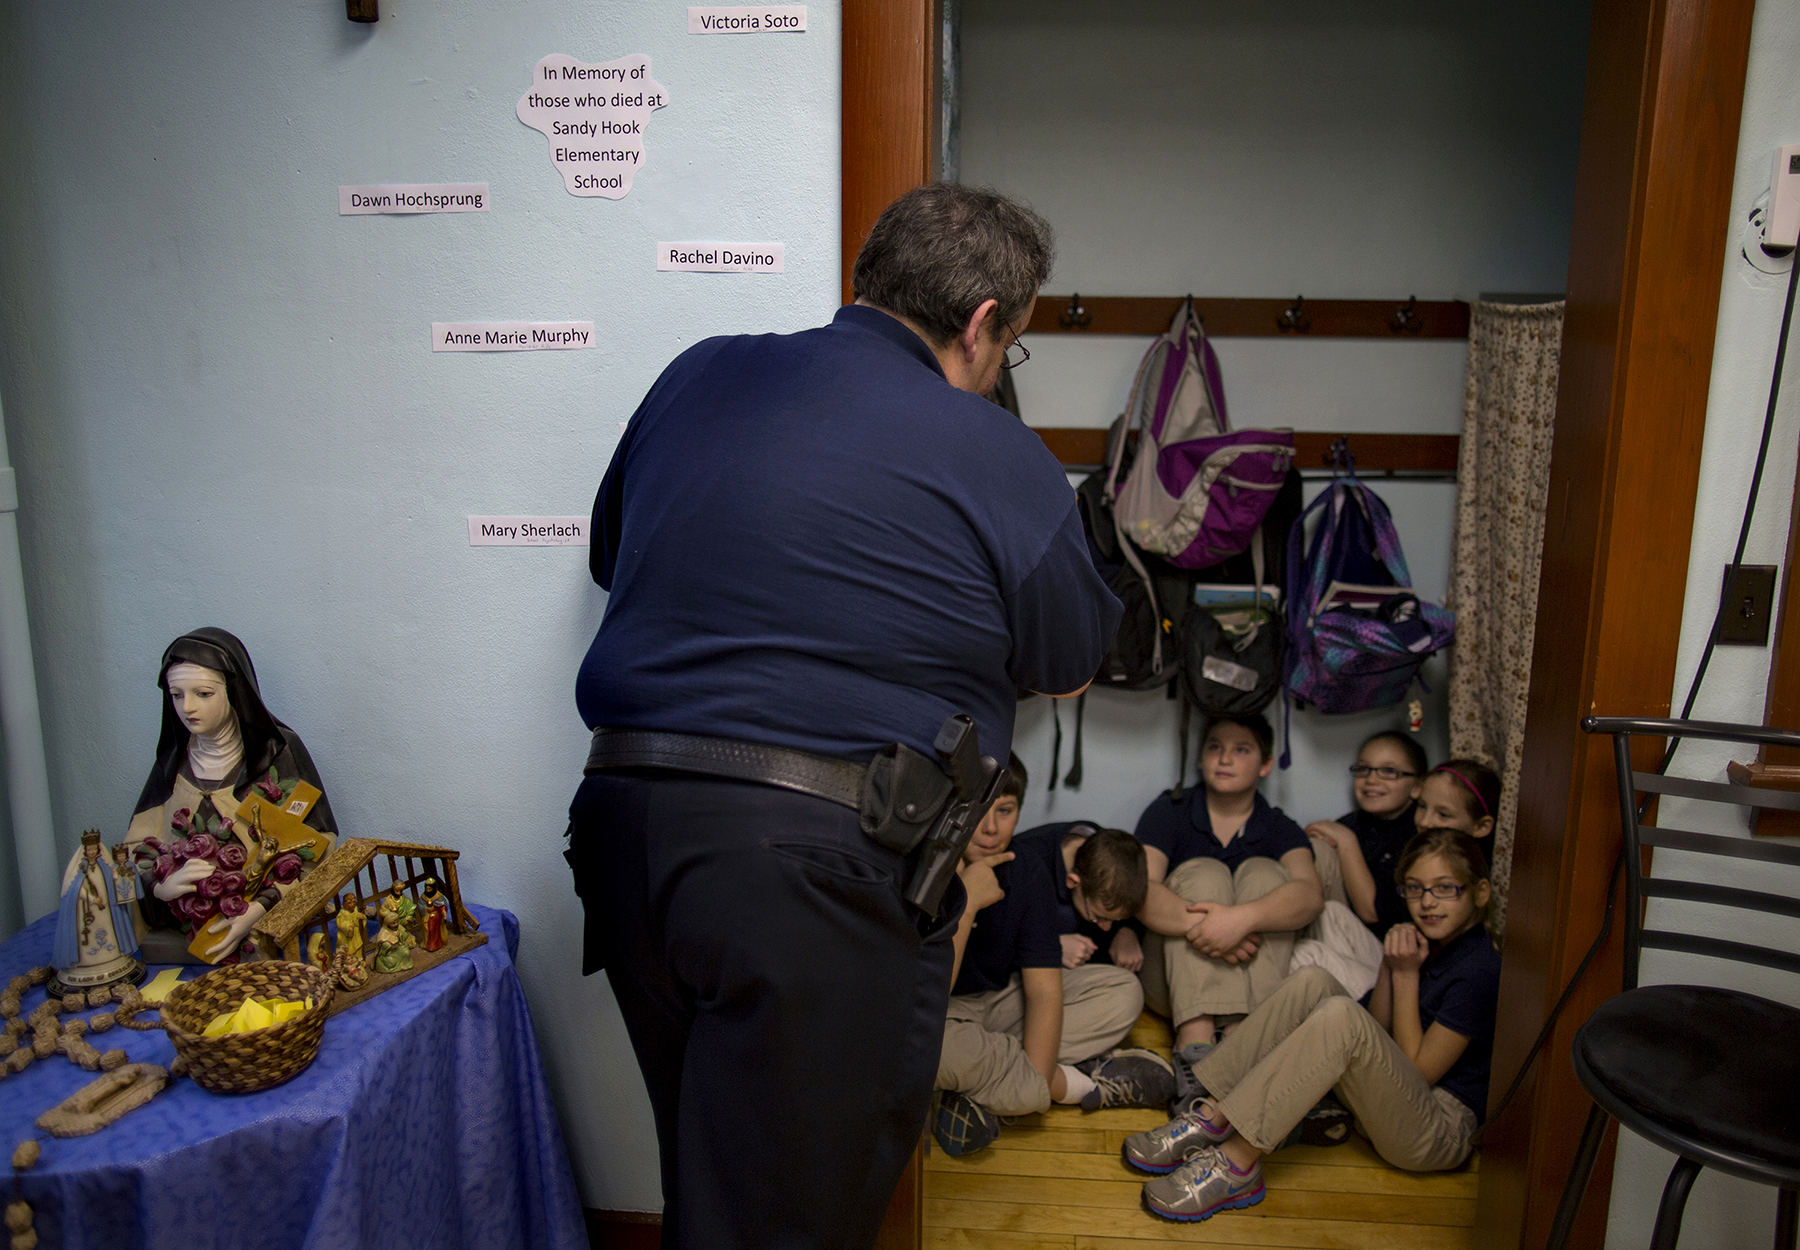 Lockdown drill in wake of Sandy Hook massacre, Ohio, USA 2013